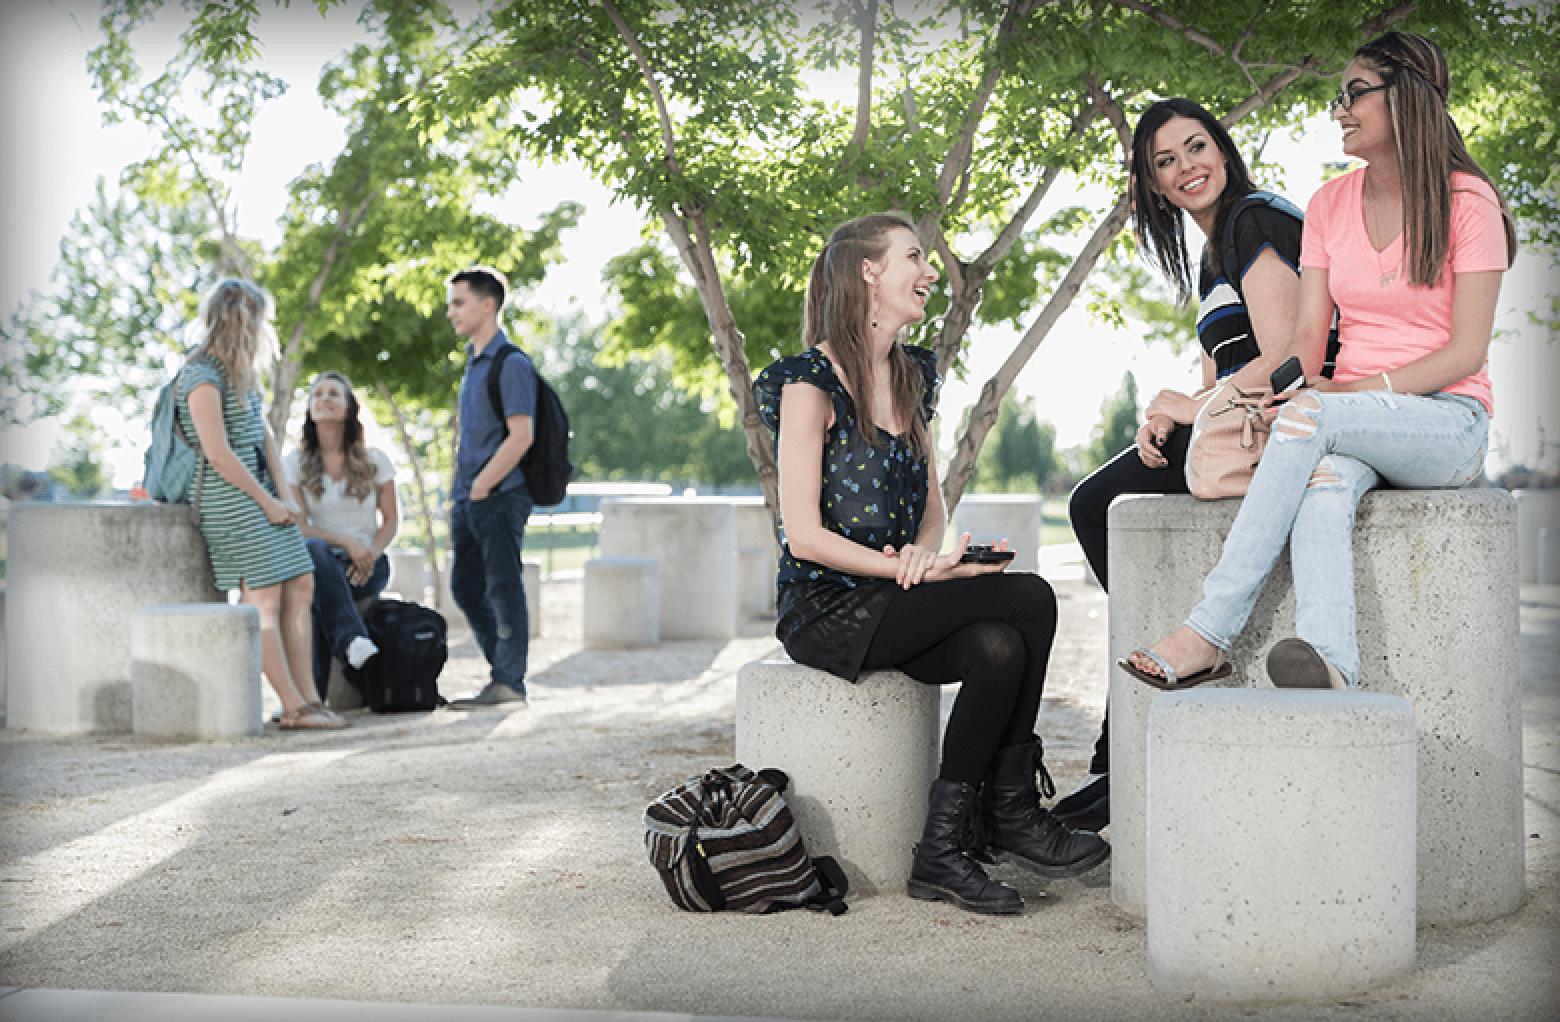 Students outside talking